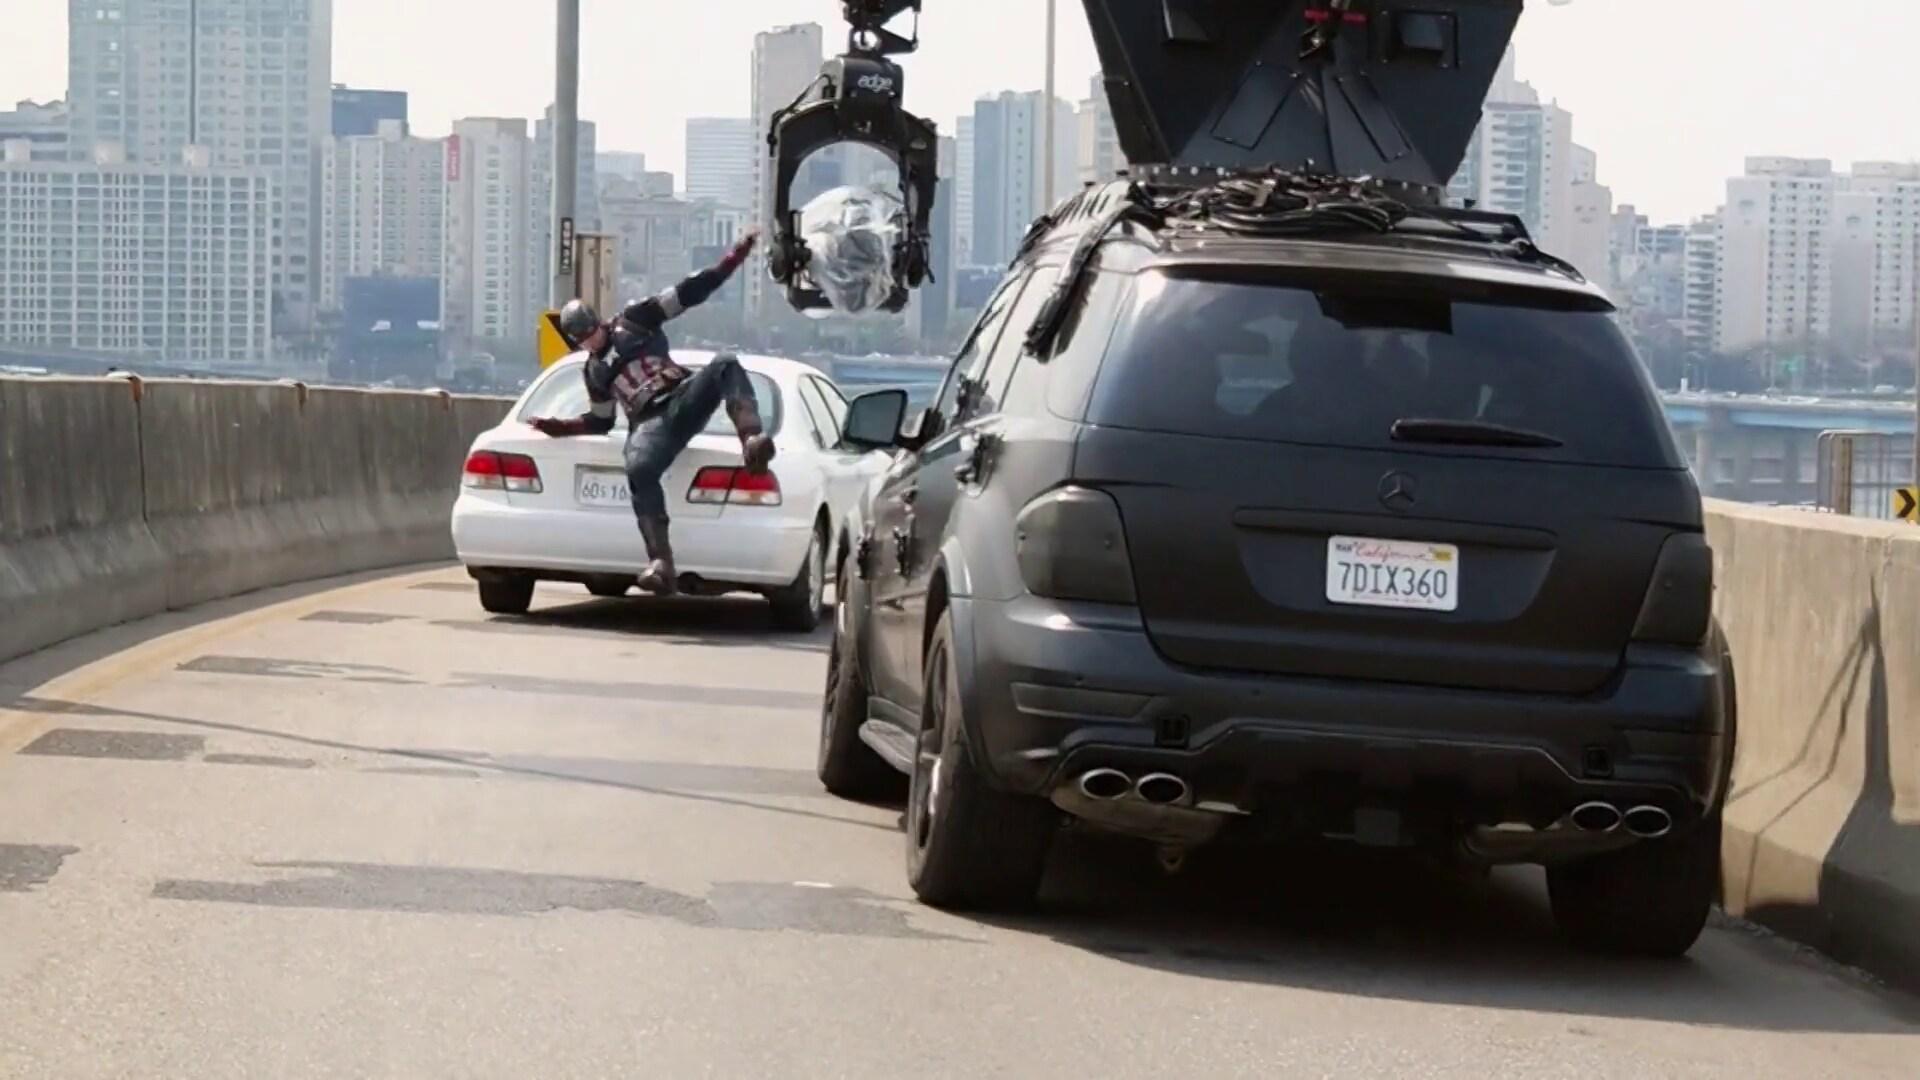 Korean Car Stunt - Avengers: Age of Ultron Behind the Scenes